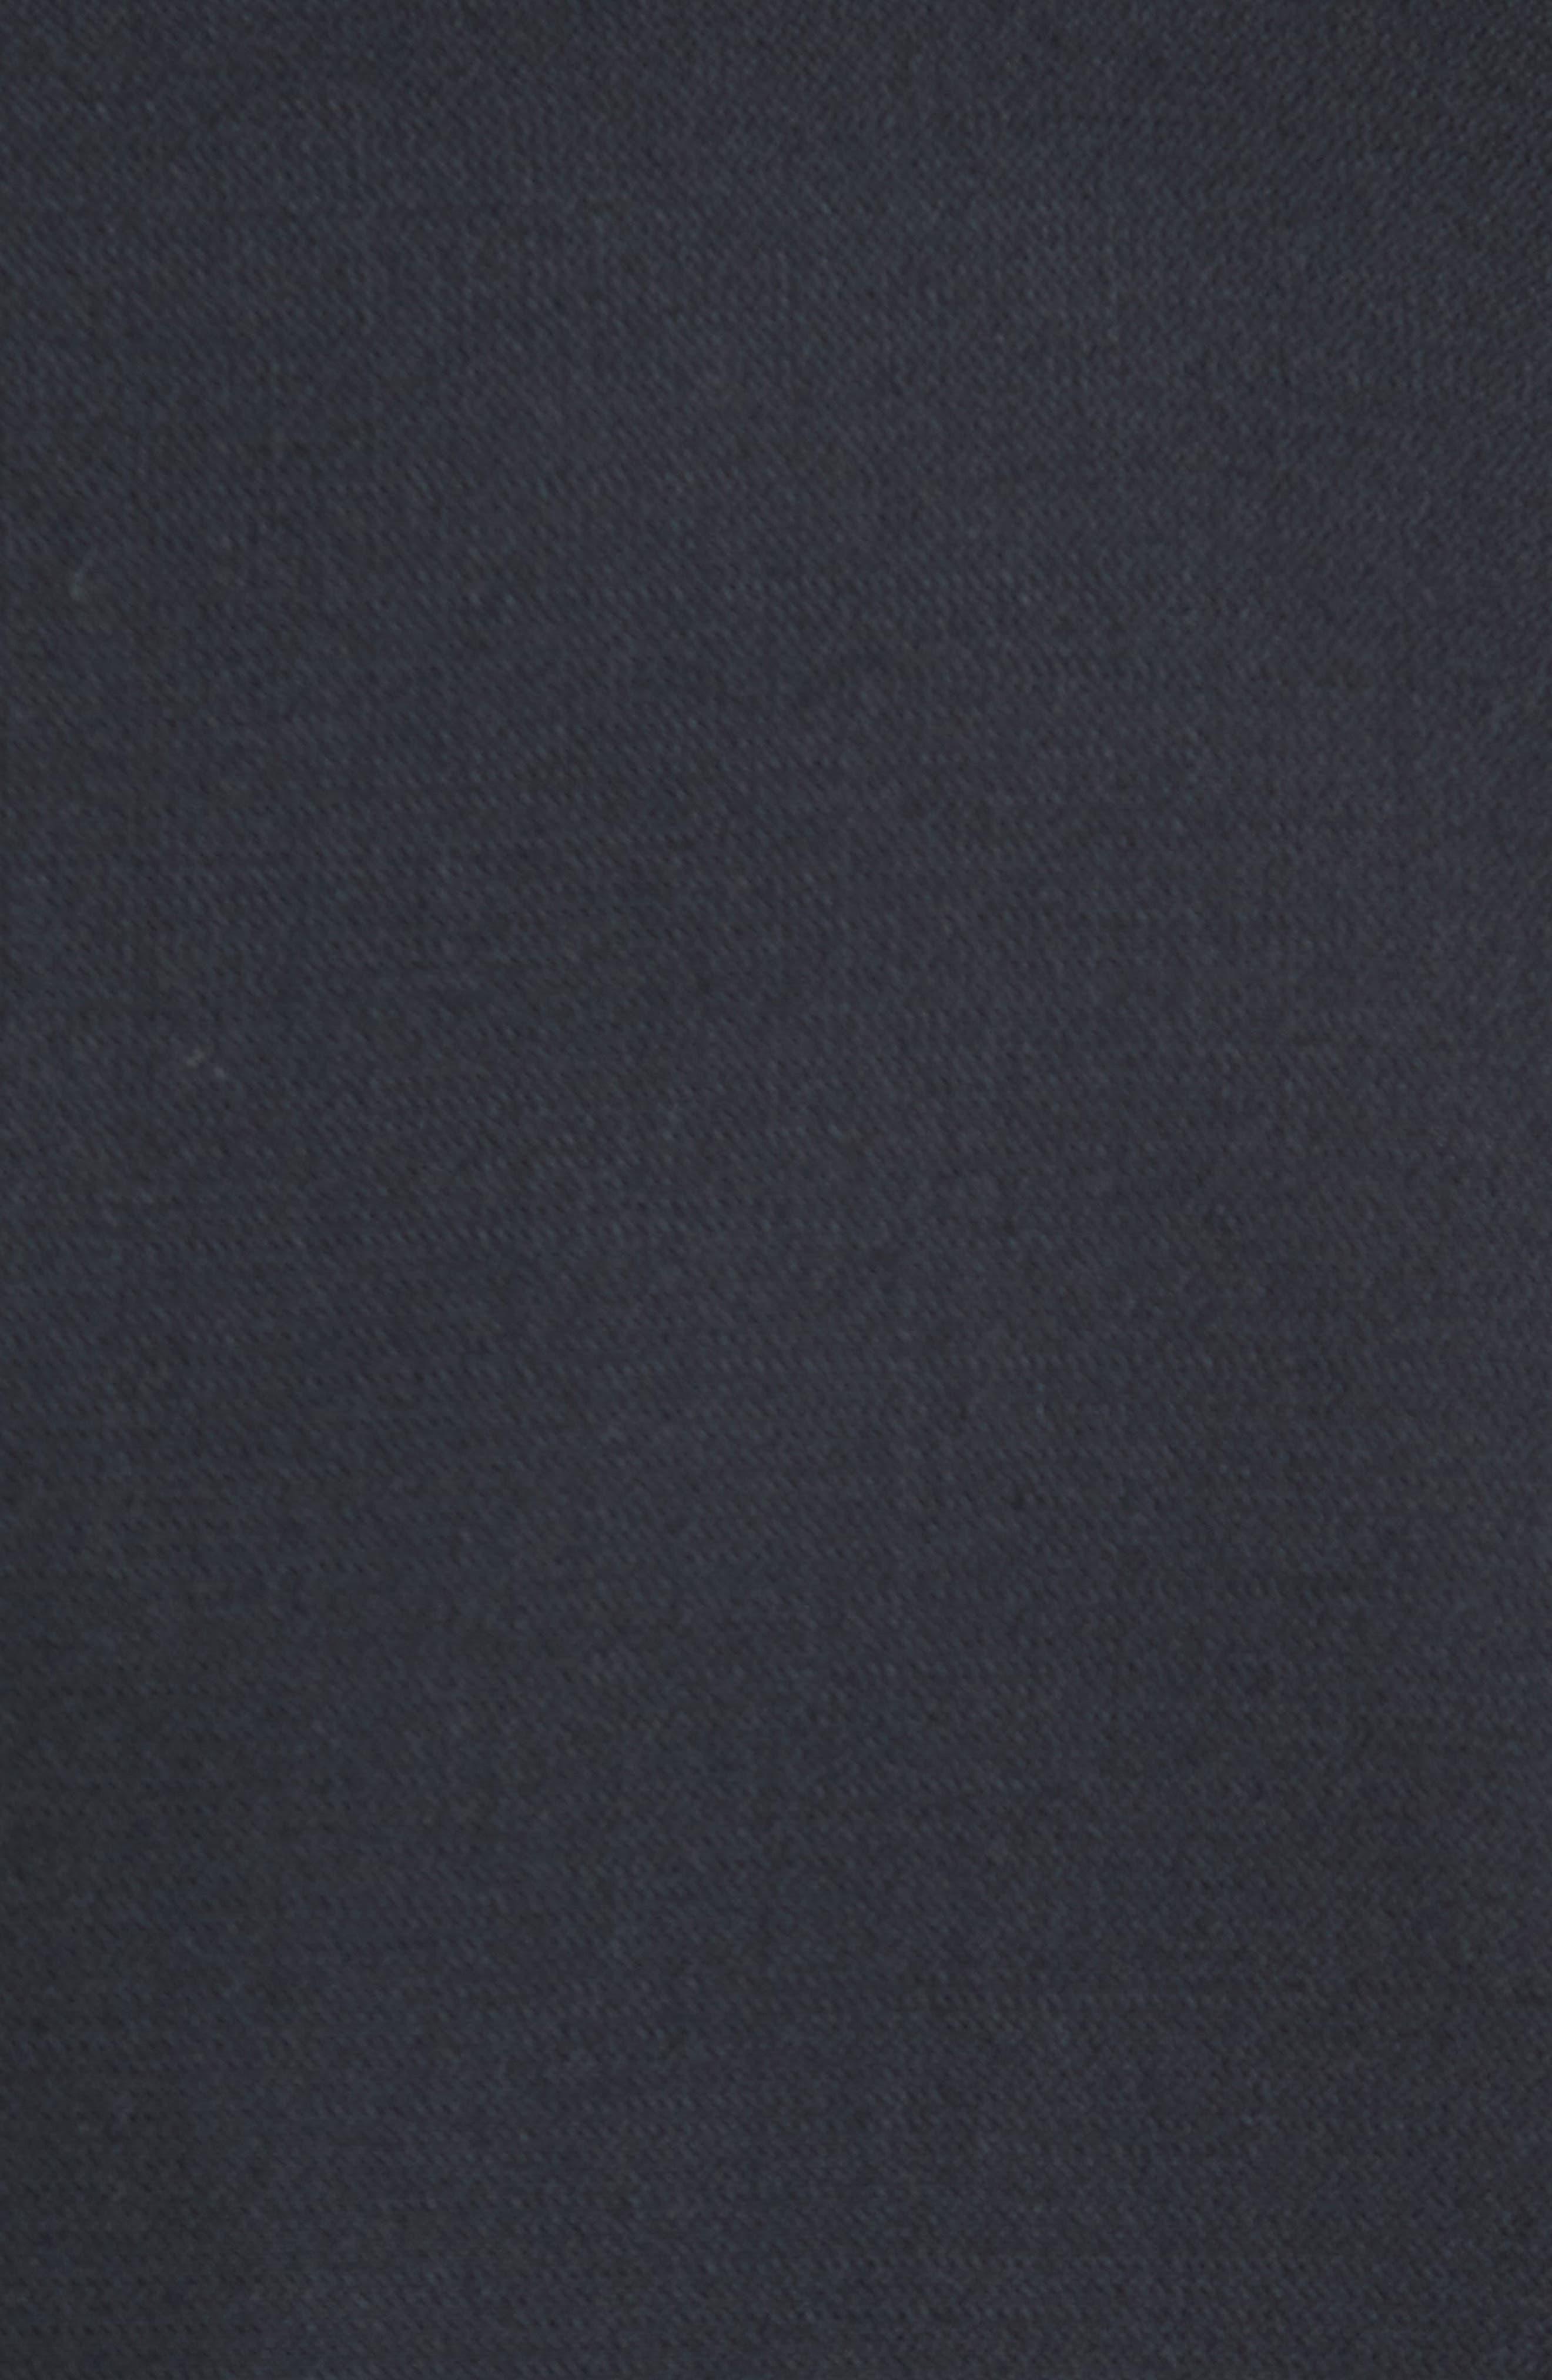 New York Classic Fit Black Wool Tuxedo,                             Alternate thumbnail 4, color,                             BLACK